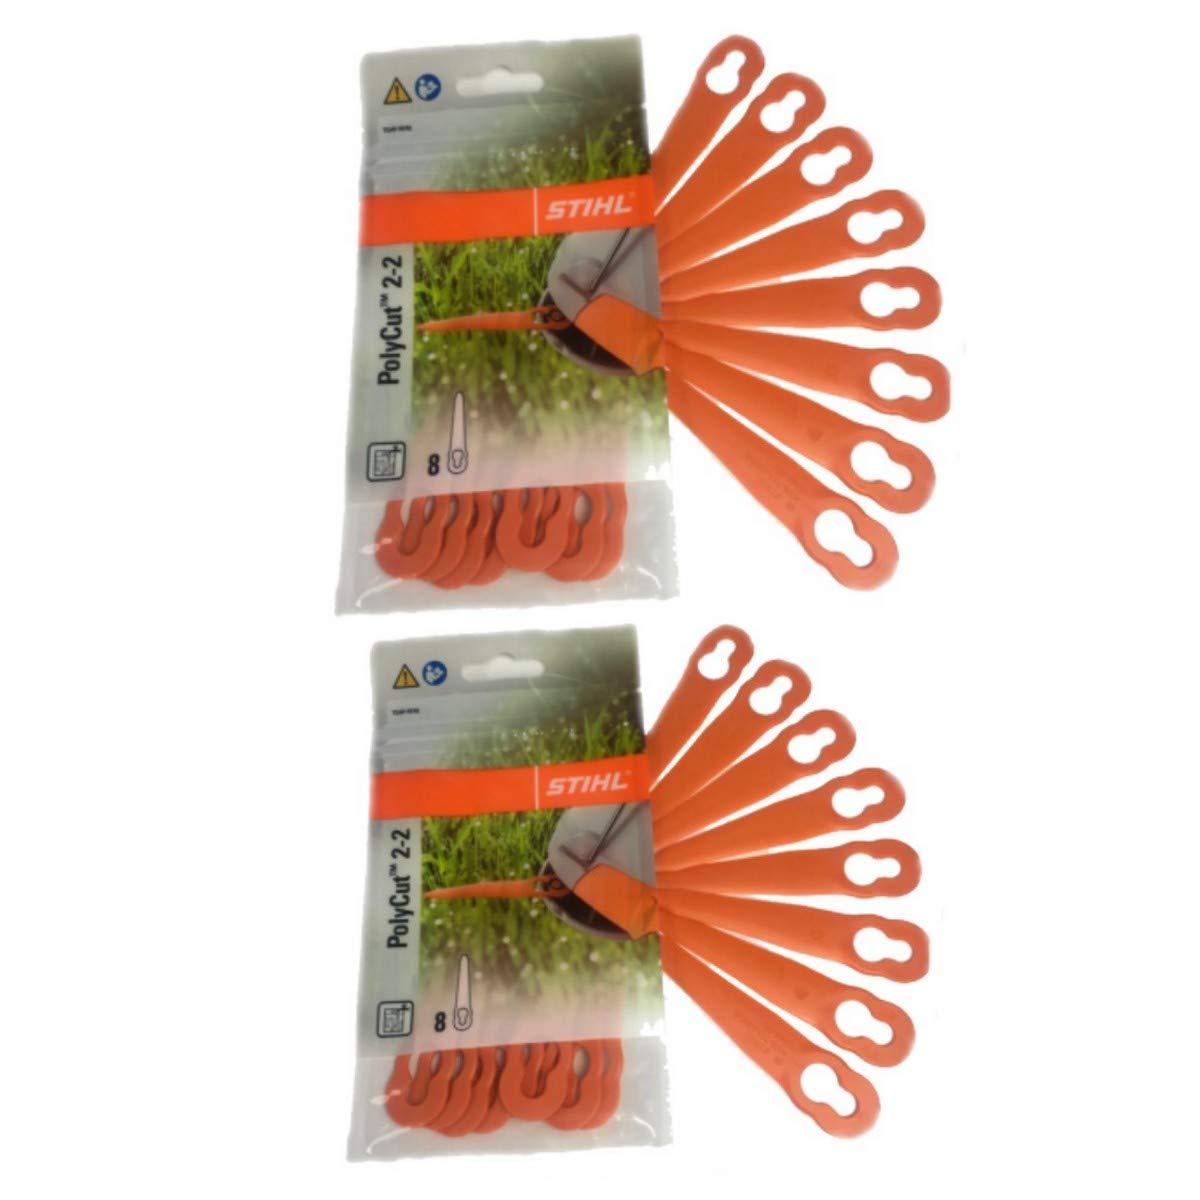 STIHL POLYCUT 2-2 COLTELLO PLASTICA PER FSA 45 tagliaerba 2 Pack (16 STÜ CK) STlHL